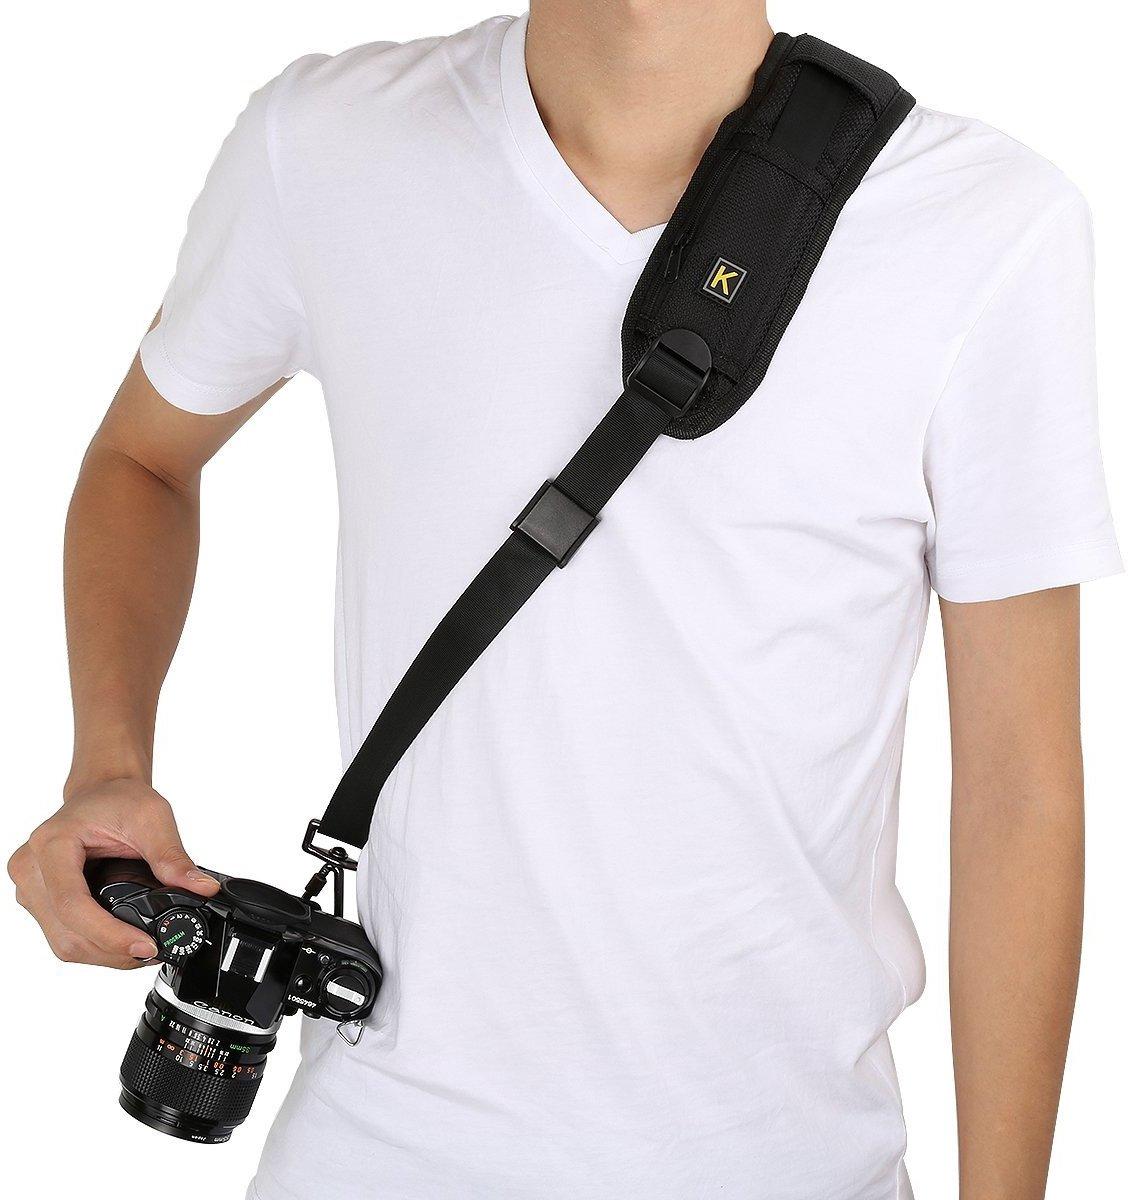 Quick Strap Camerariem DSLR - Luxe Draagriem Camera Strap kopen